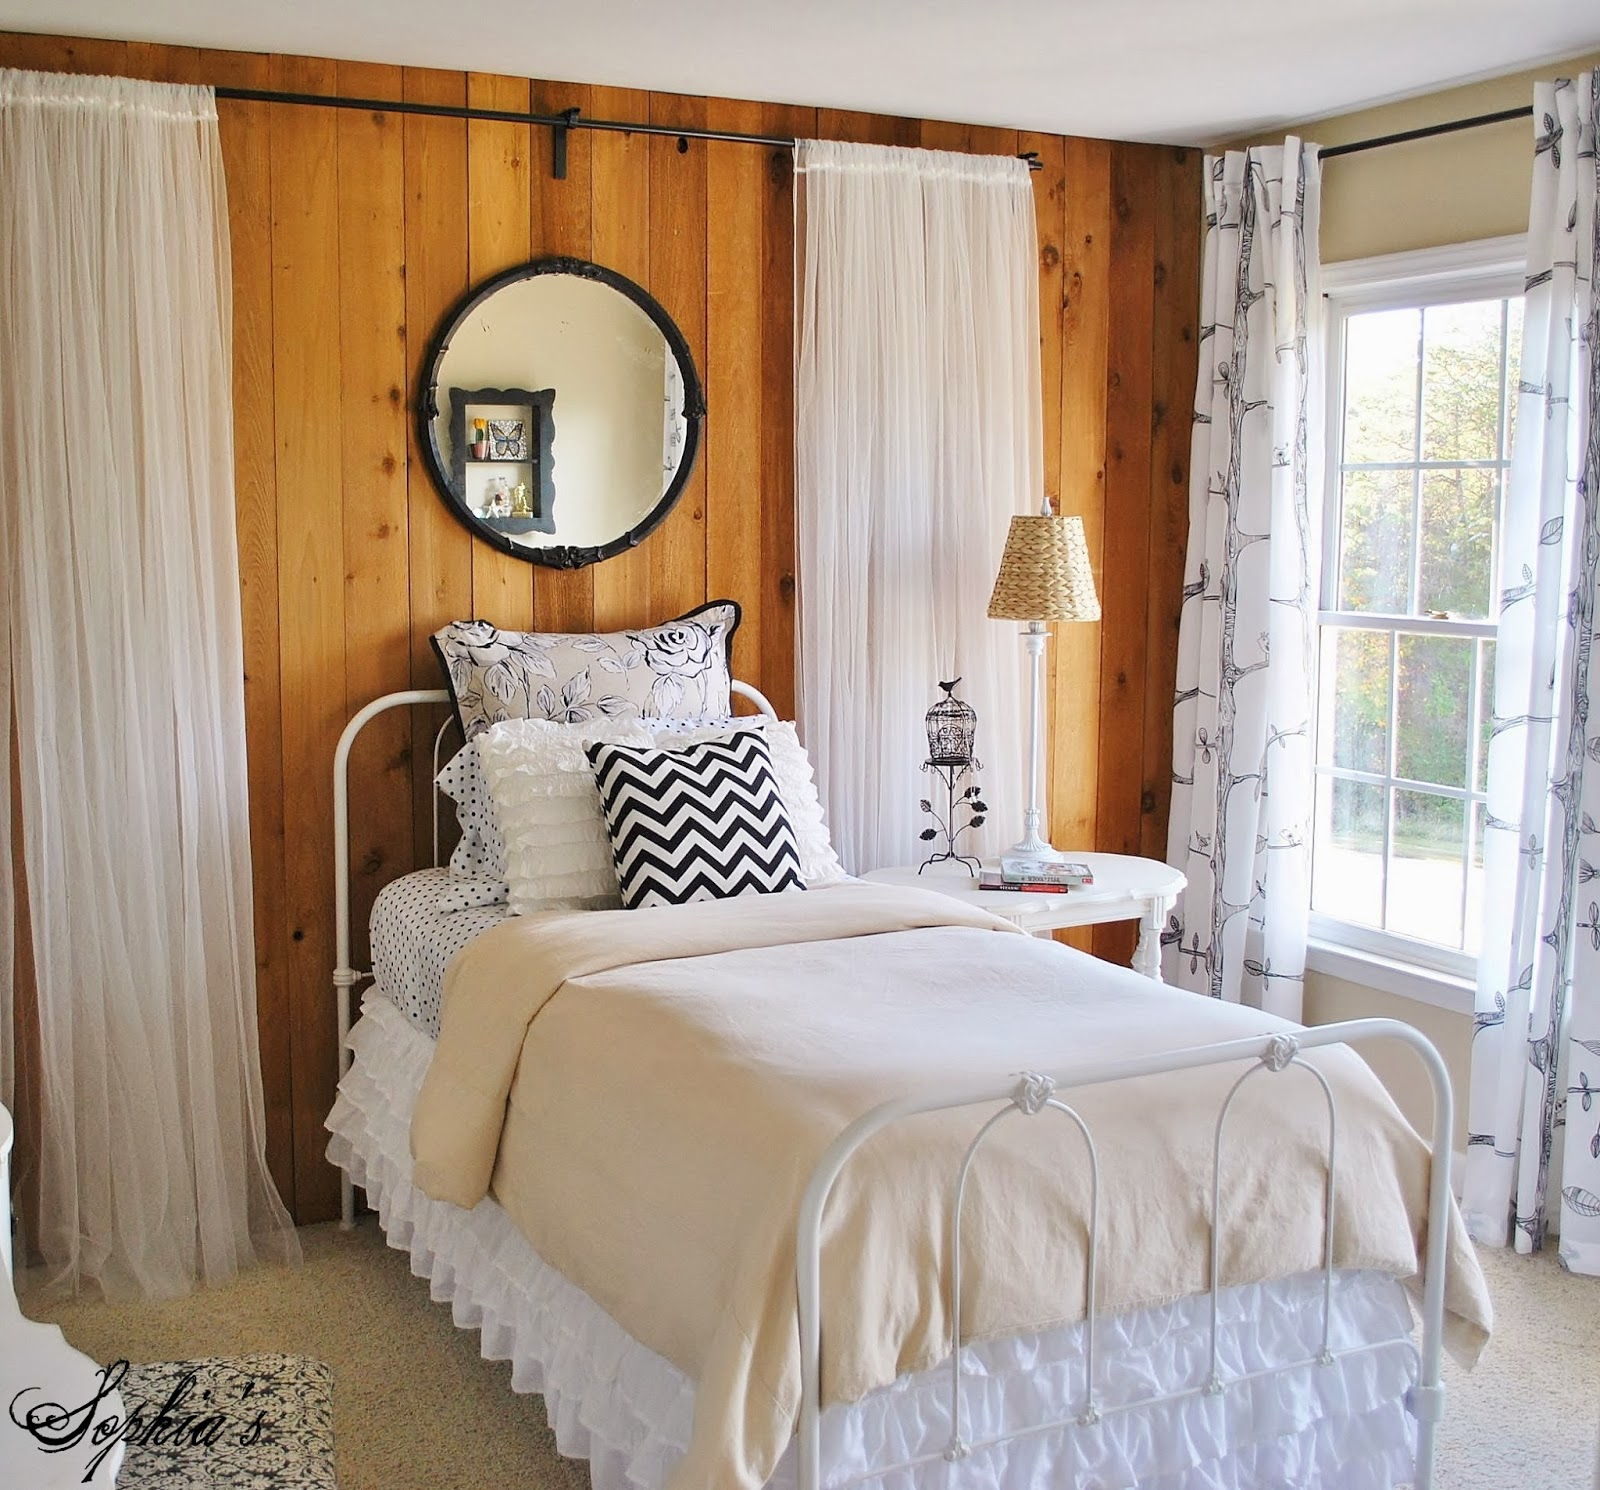 Sophia S Budget Bedroom Makeover For A Rental Home